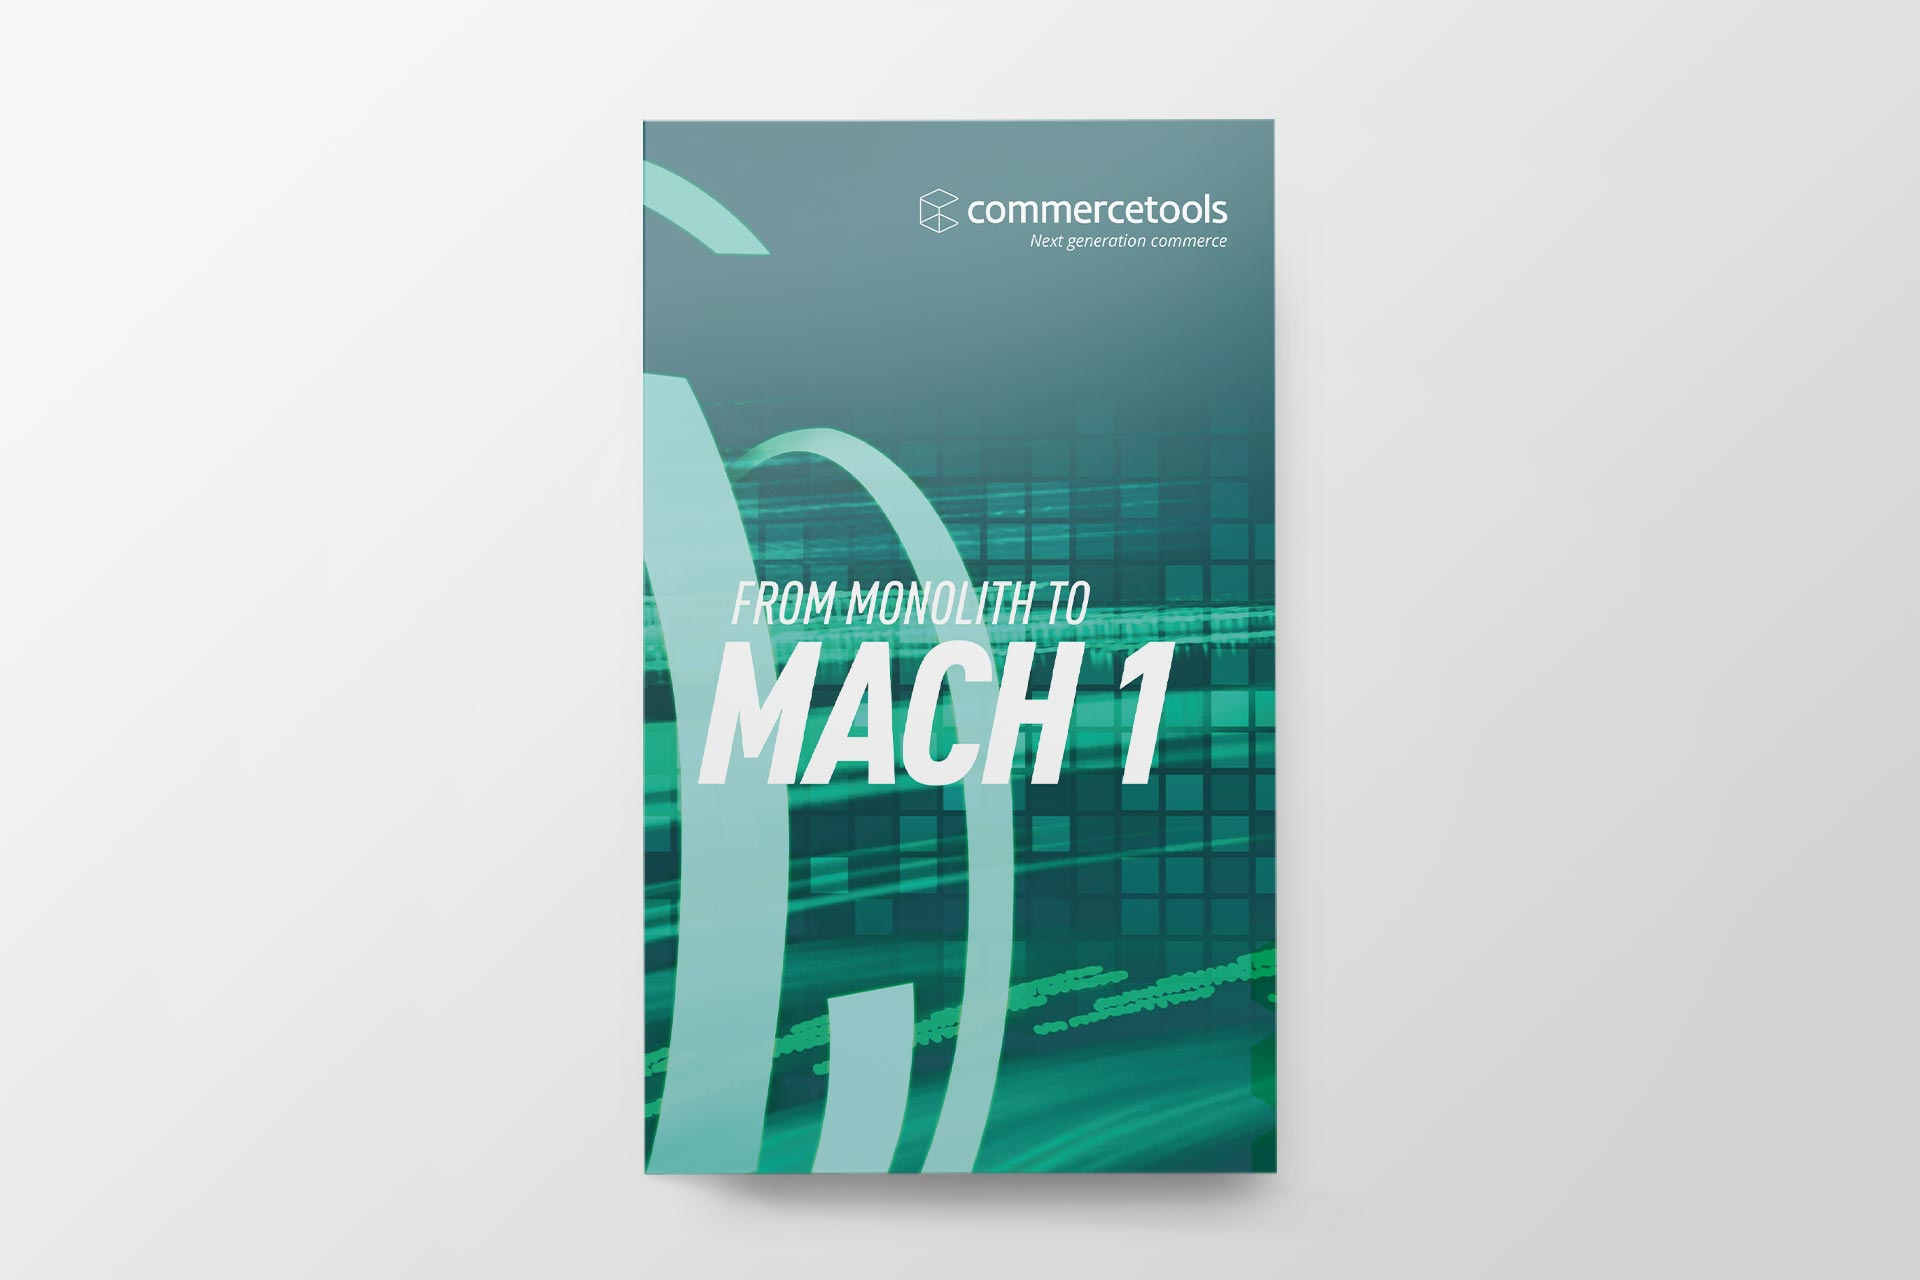 BON_COM_shoptalk_2019_mach1_brochure_cover.jpg